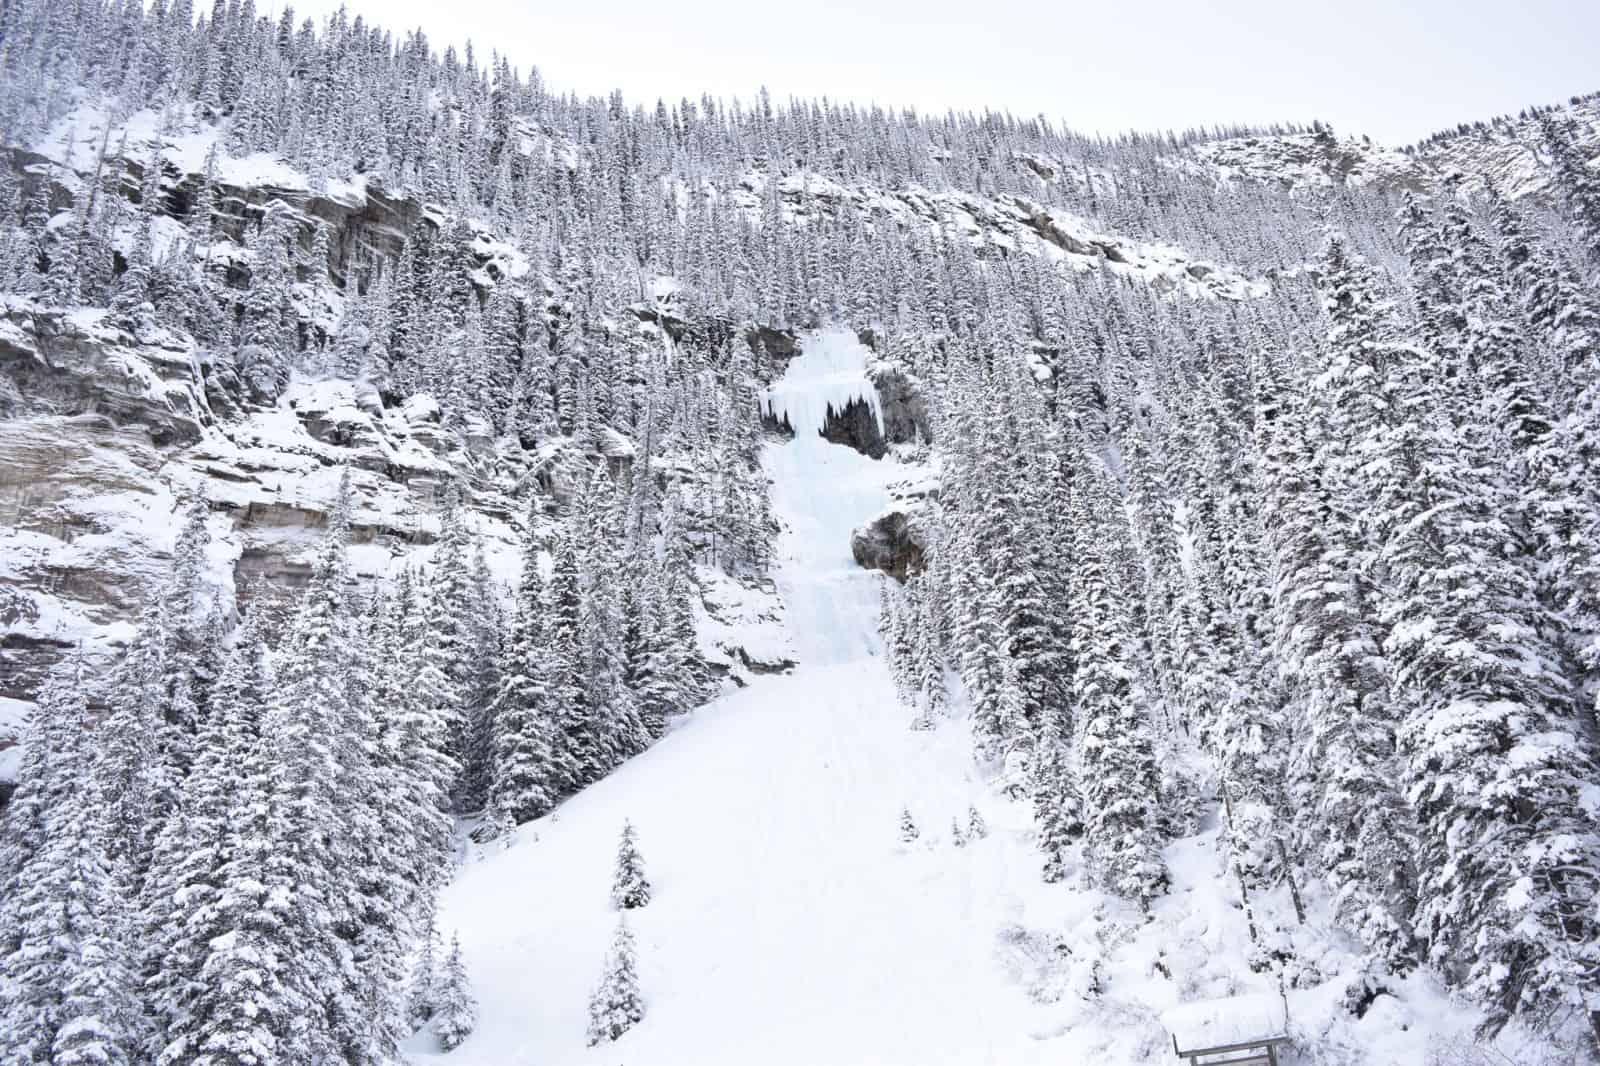 Banff Frozen Waterfall Banff in winter